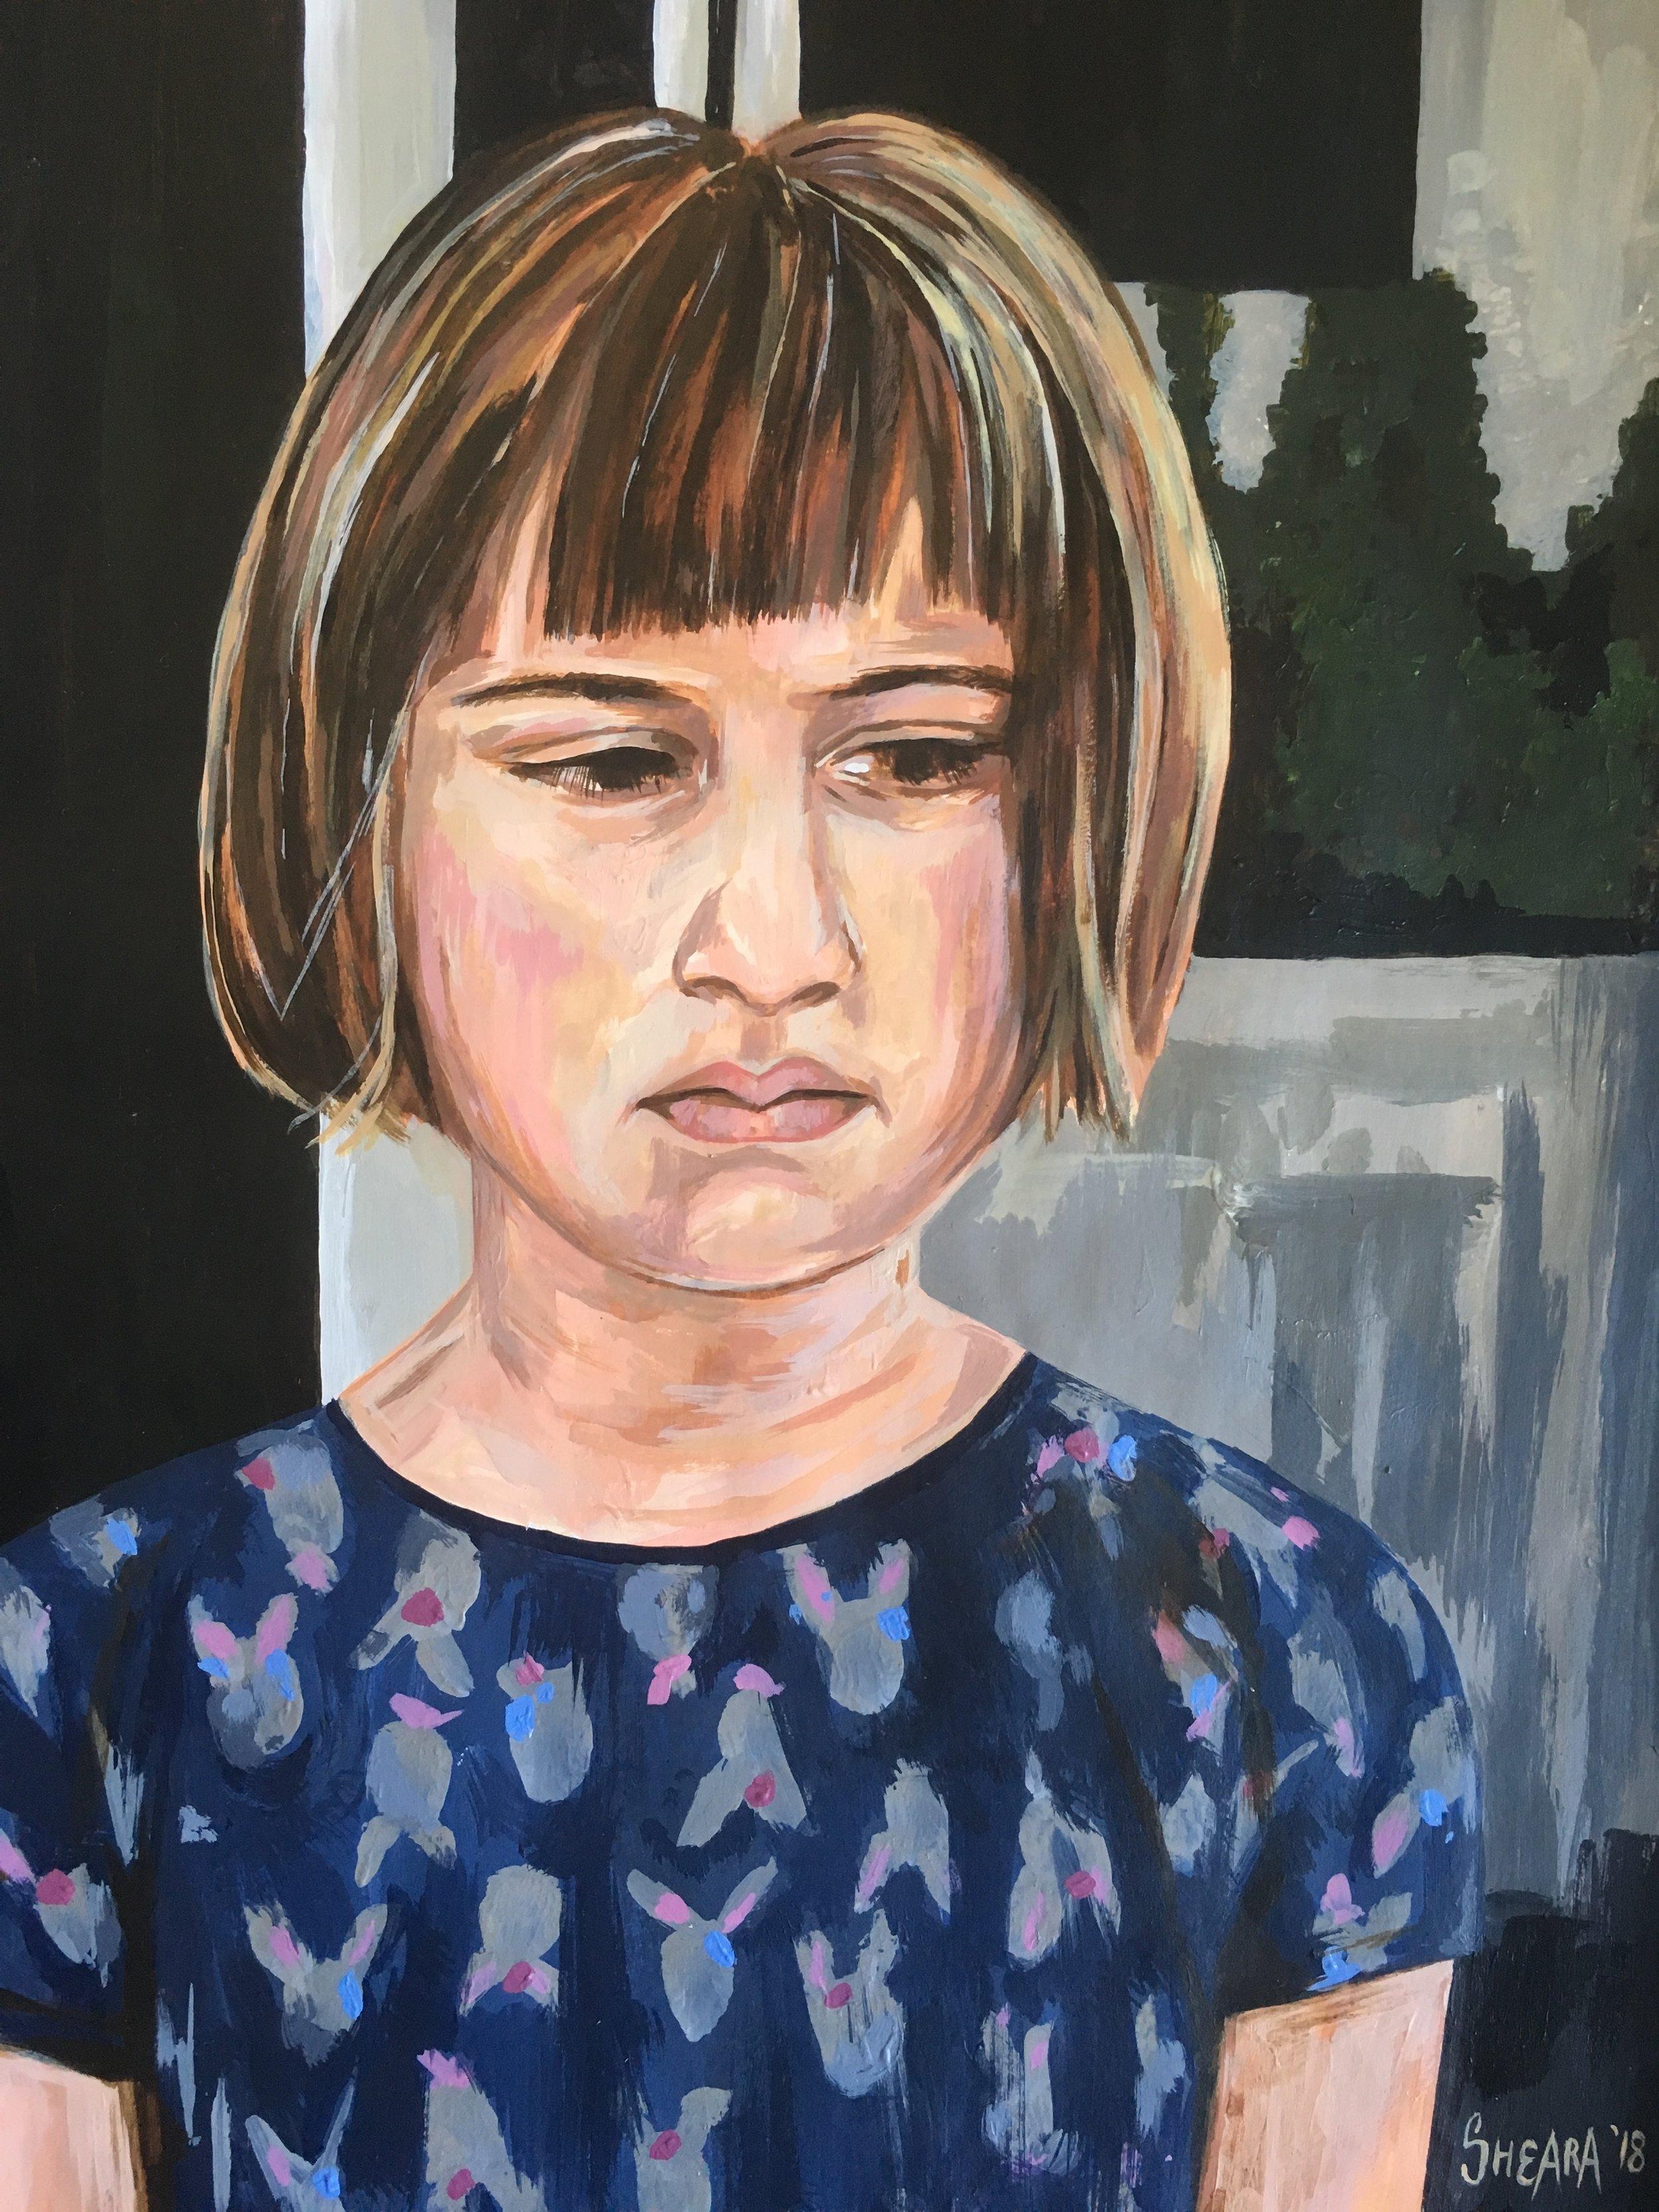 People's Choice Award Winner: 'Girl in the Rabbit Dress' by Sheara Abrahams